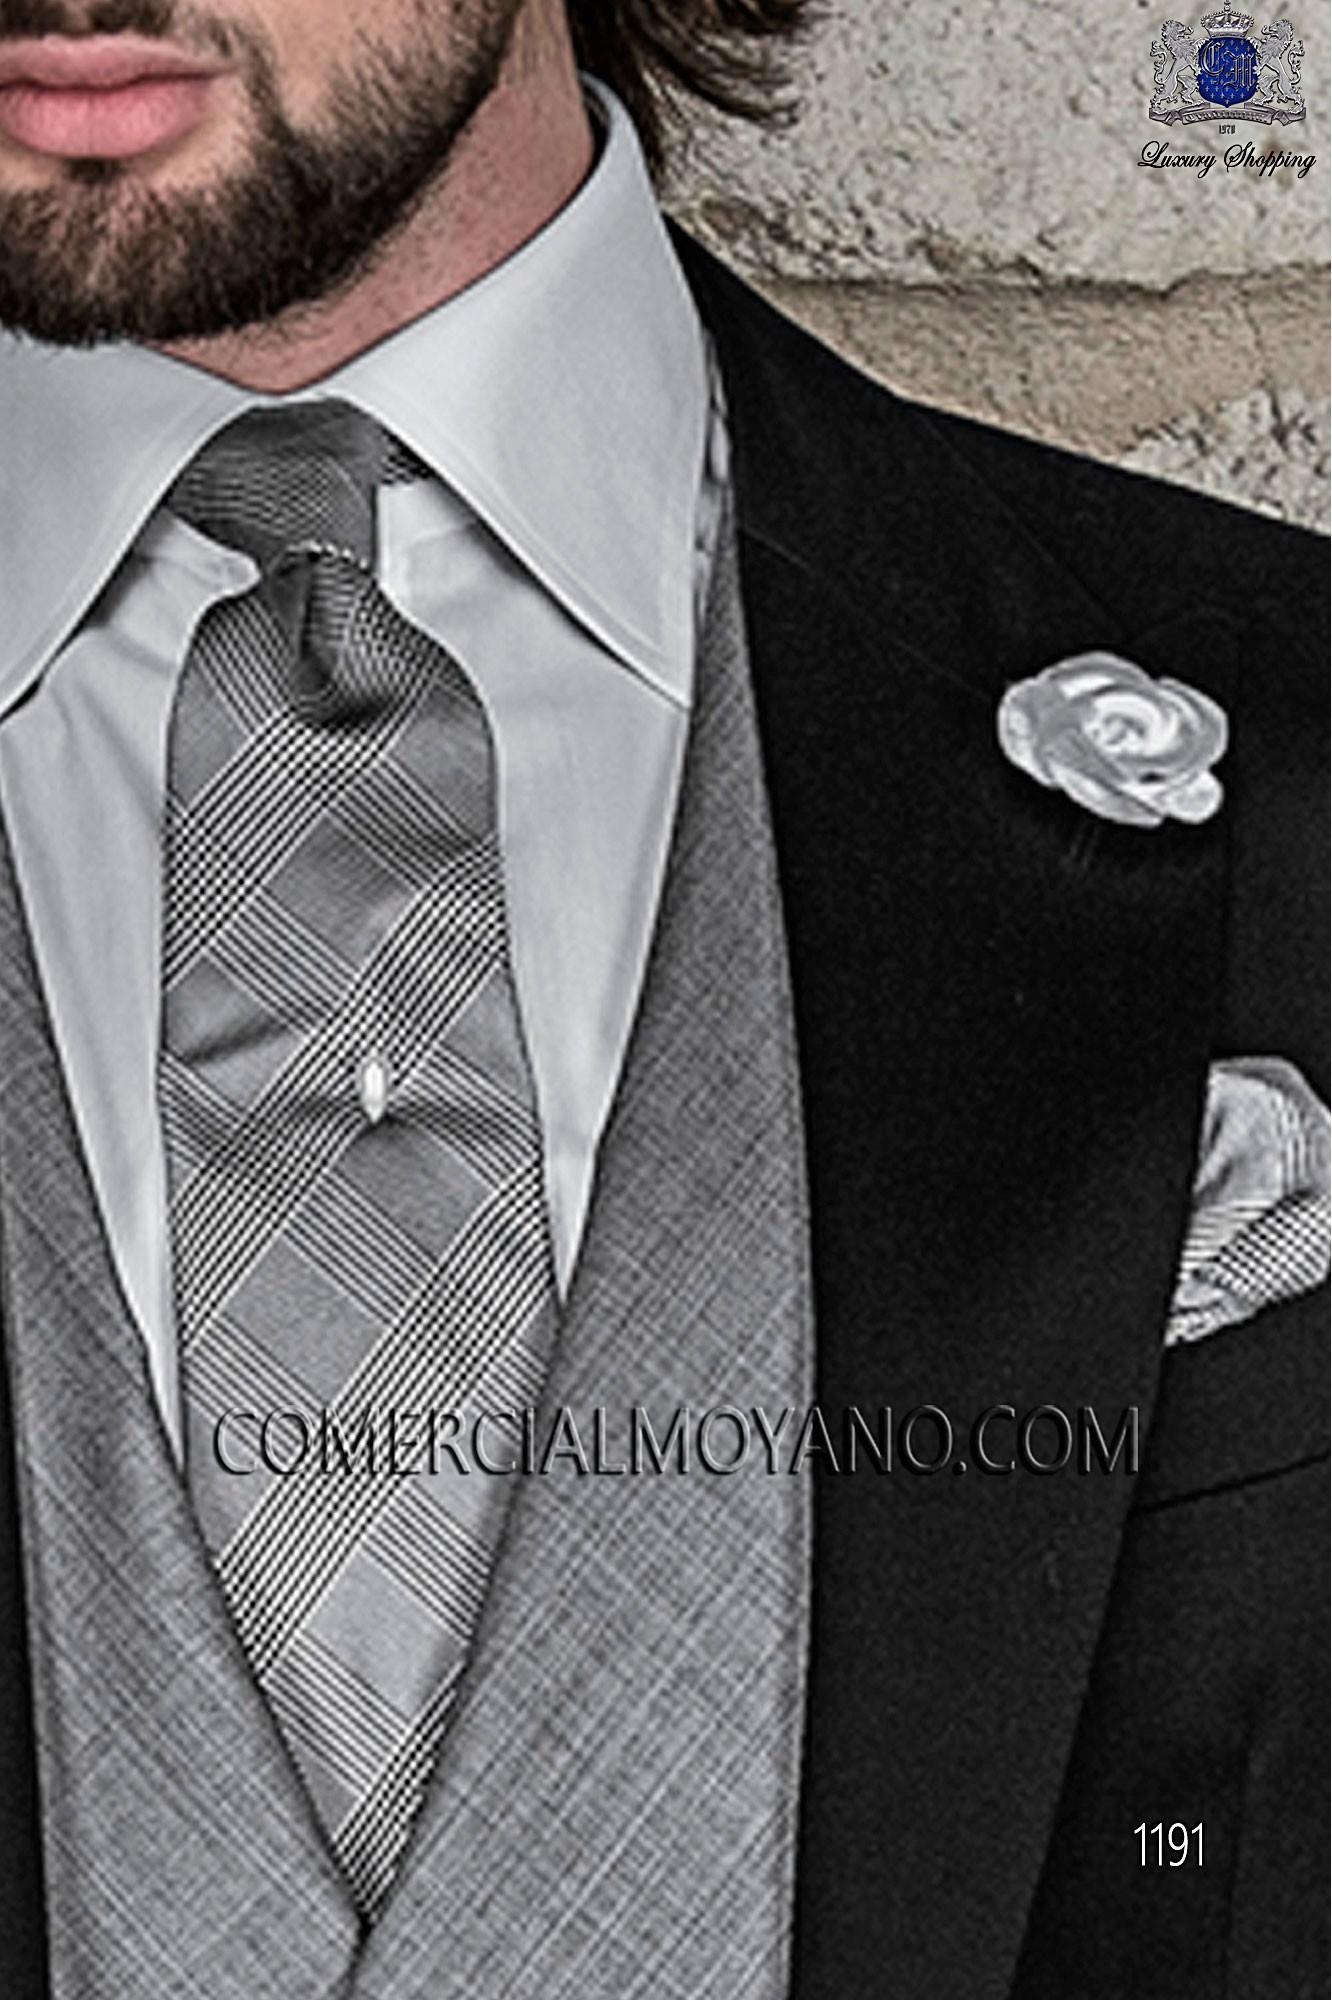 a5e262552bab4 Traje de novio gris de estilo entallado en tejido lana de alpaca ...